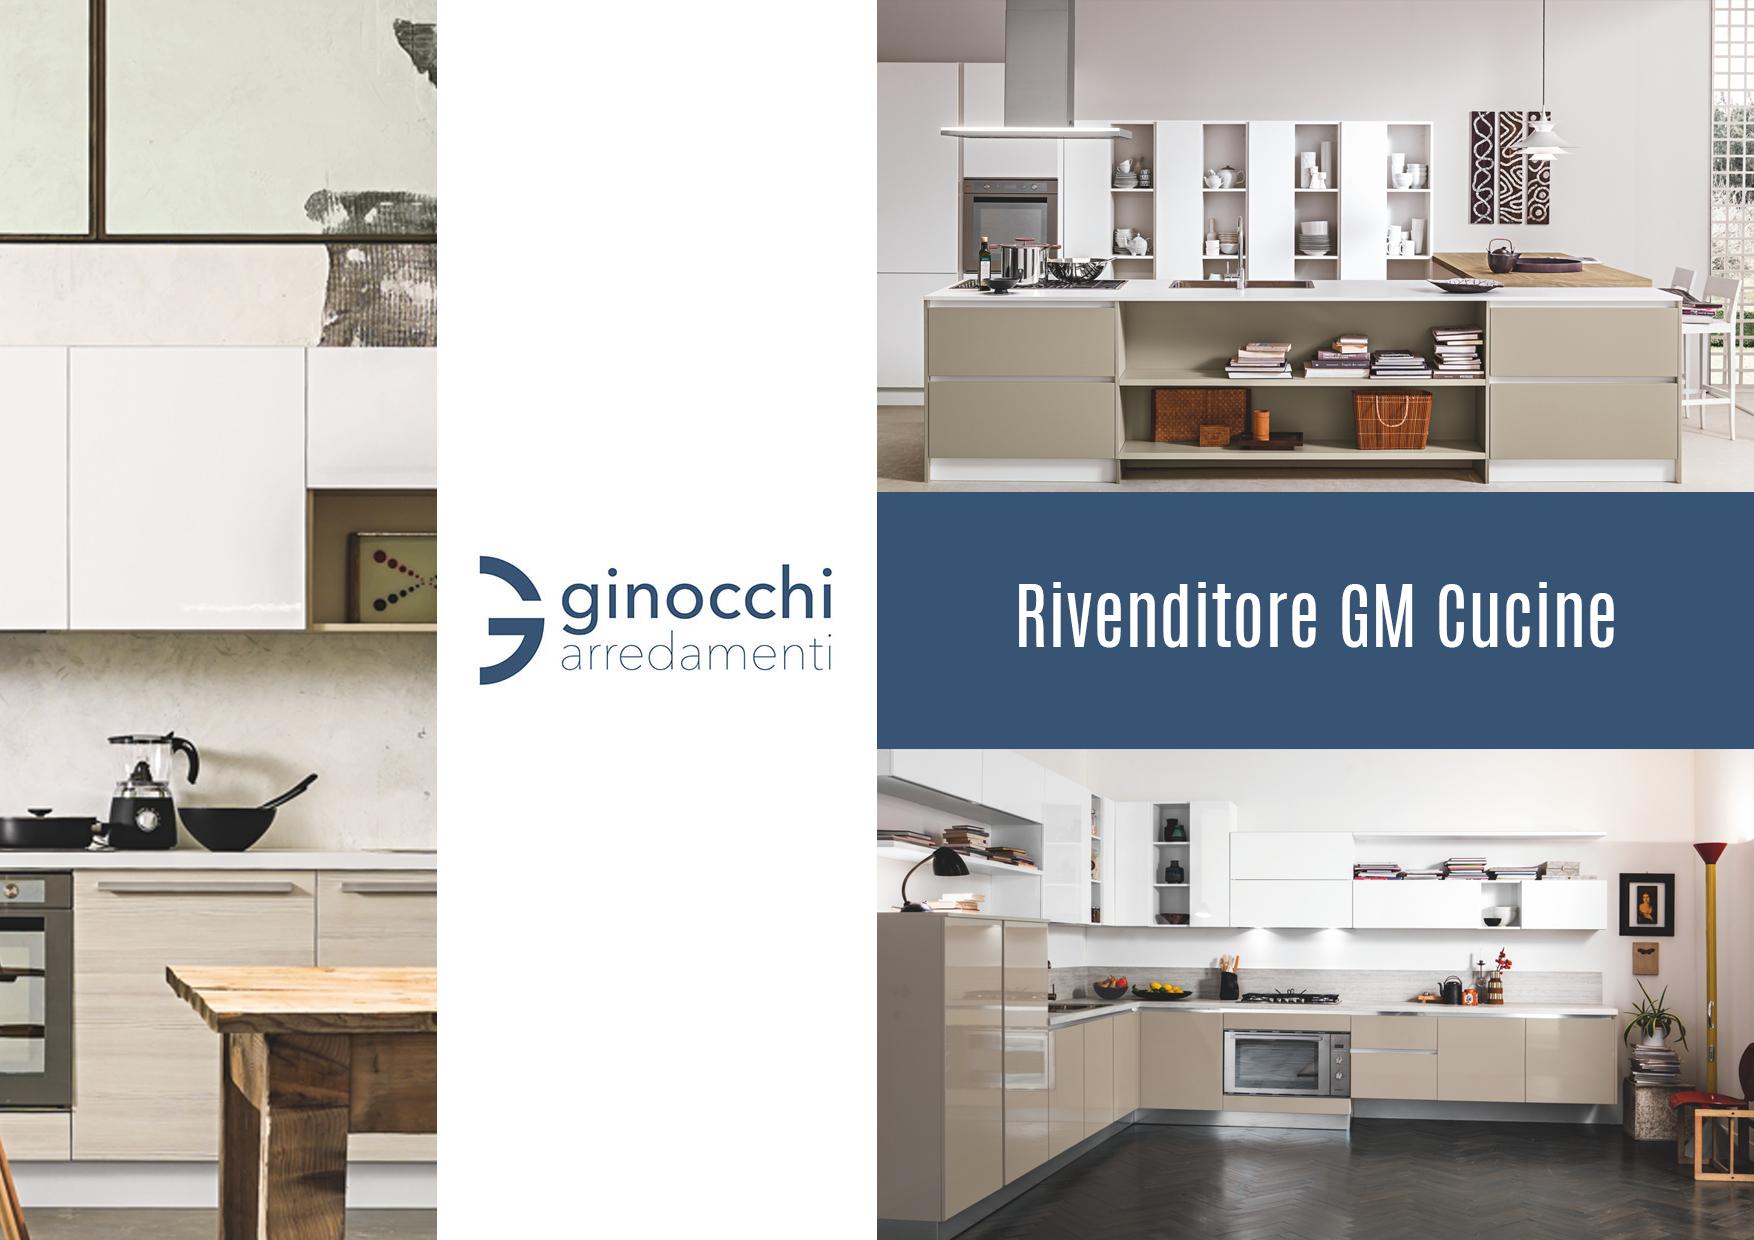 Rivenditore gm cucine ginocchi arredamenti for Ginocchi arredamenti